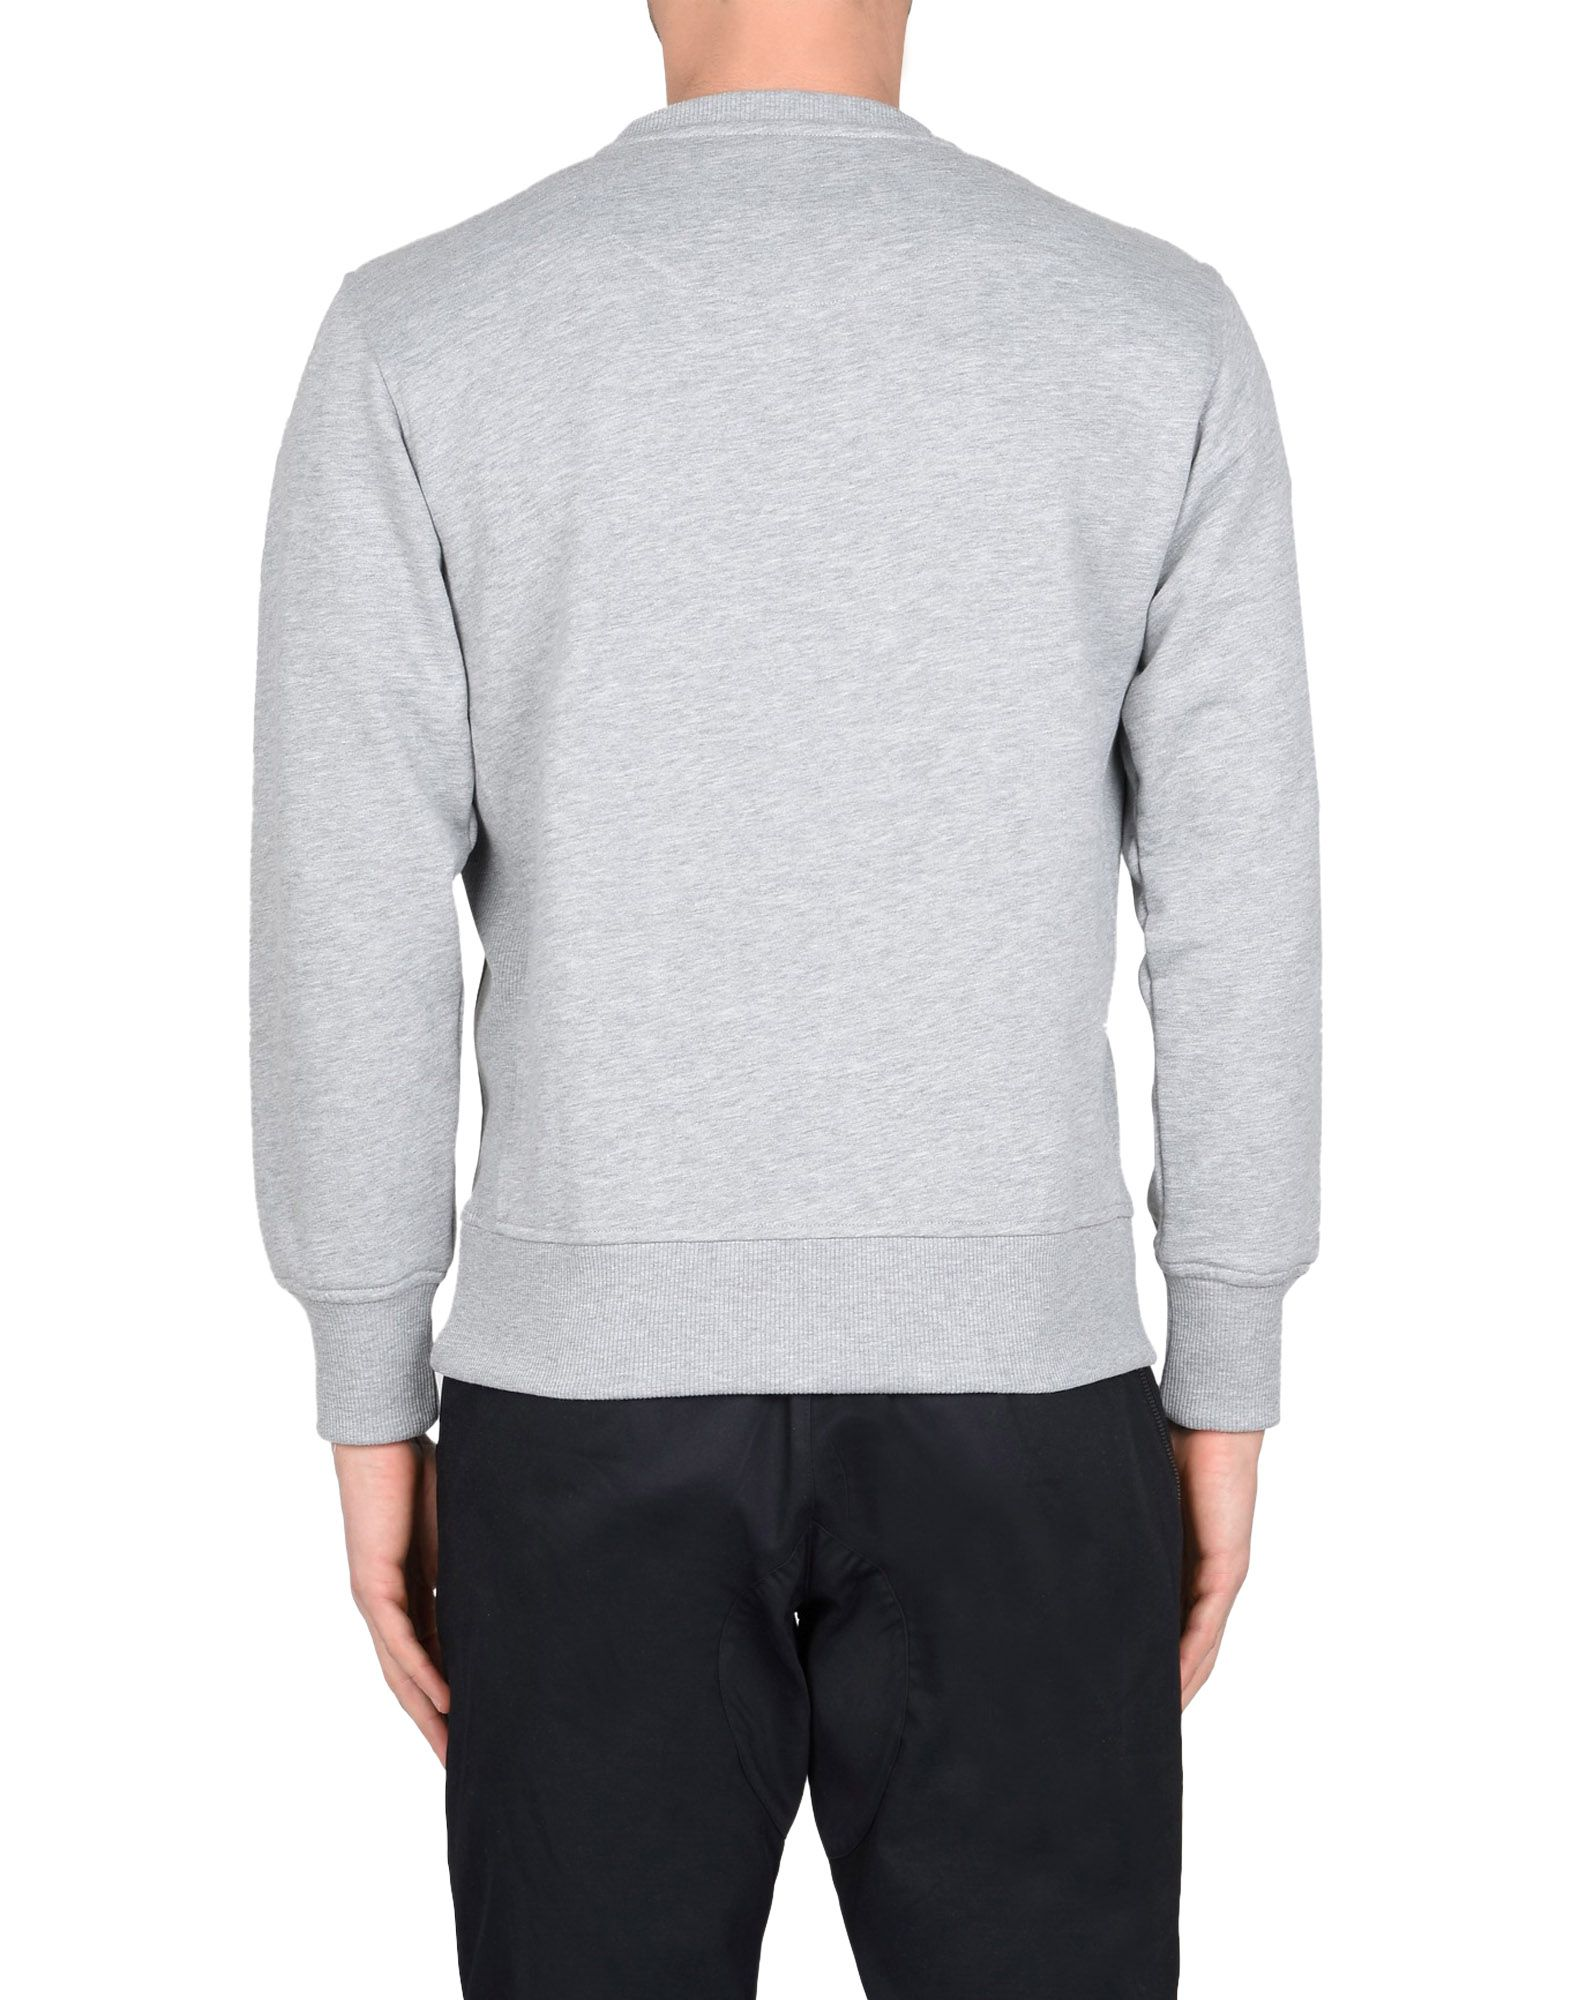 Felpa Umbro Umbro Felpa X House Of Holland  Snake Applique Sweatshirt - Uomo - 12002468GV 48f211